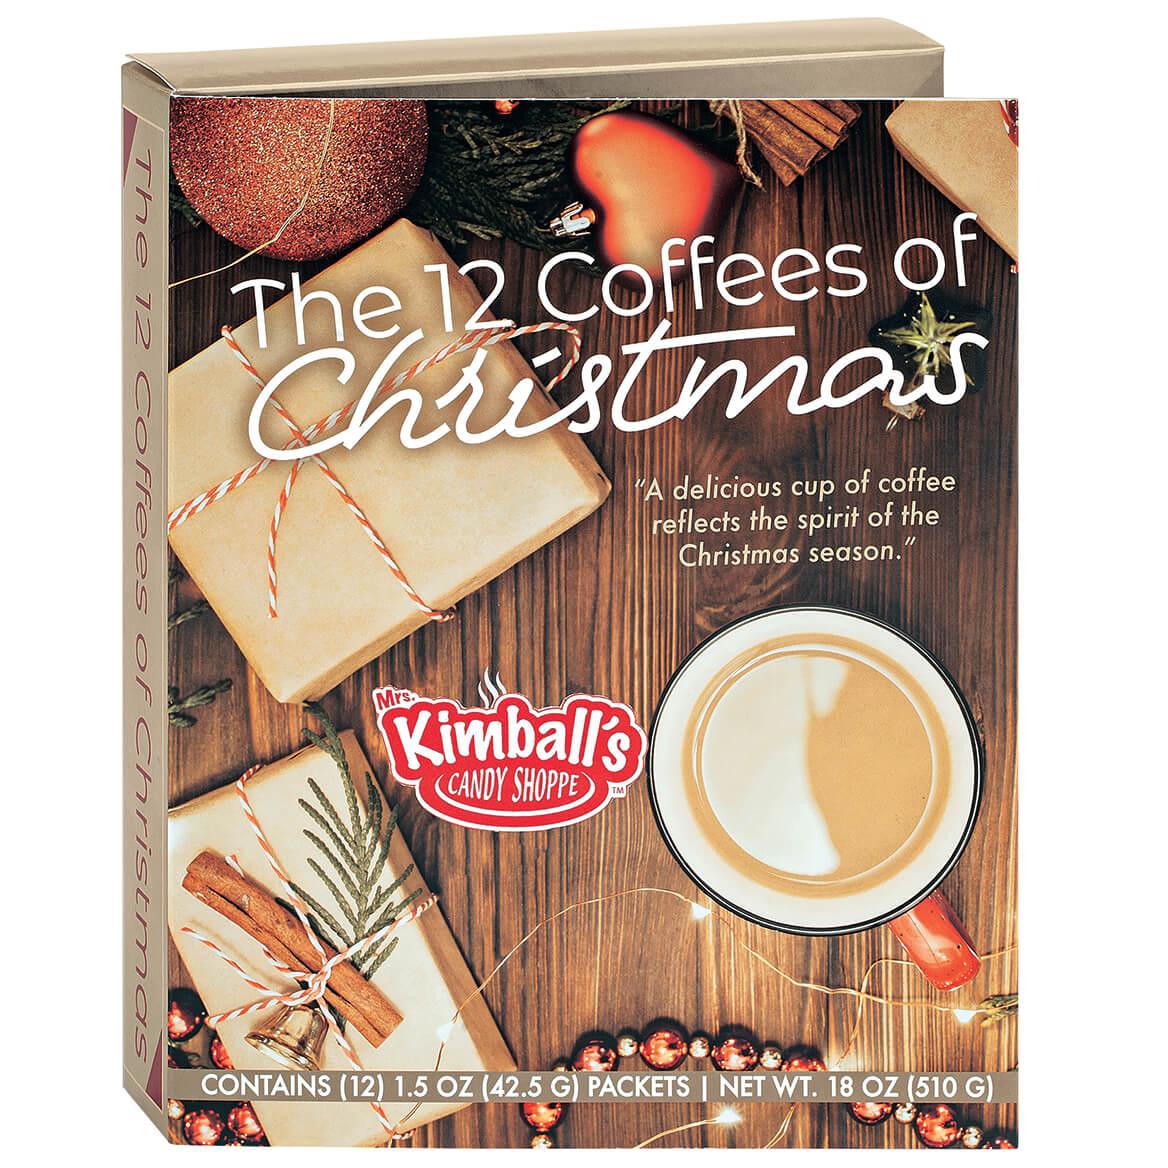 Twelve Coffees of Christmas-311863